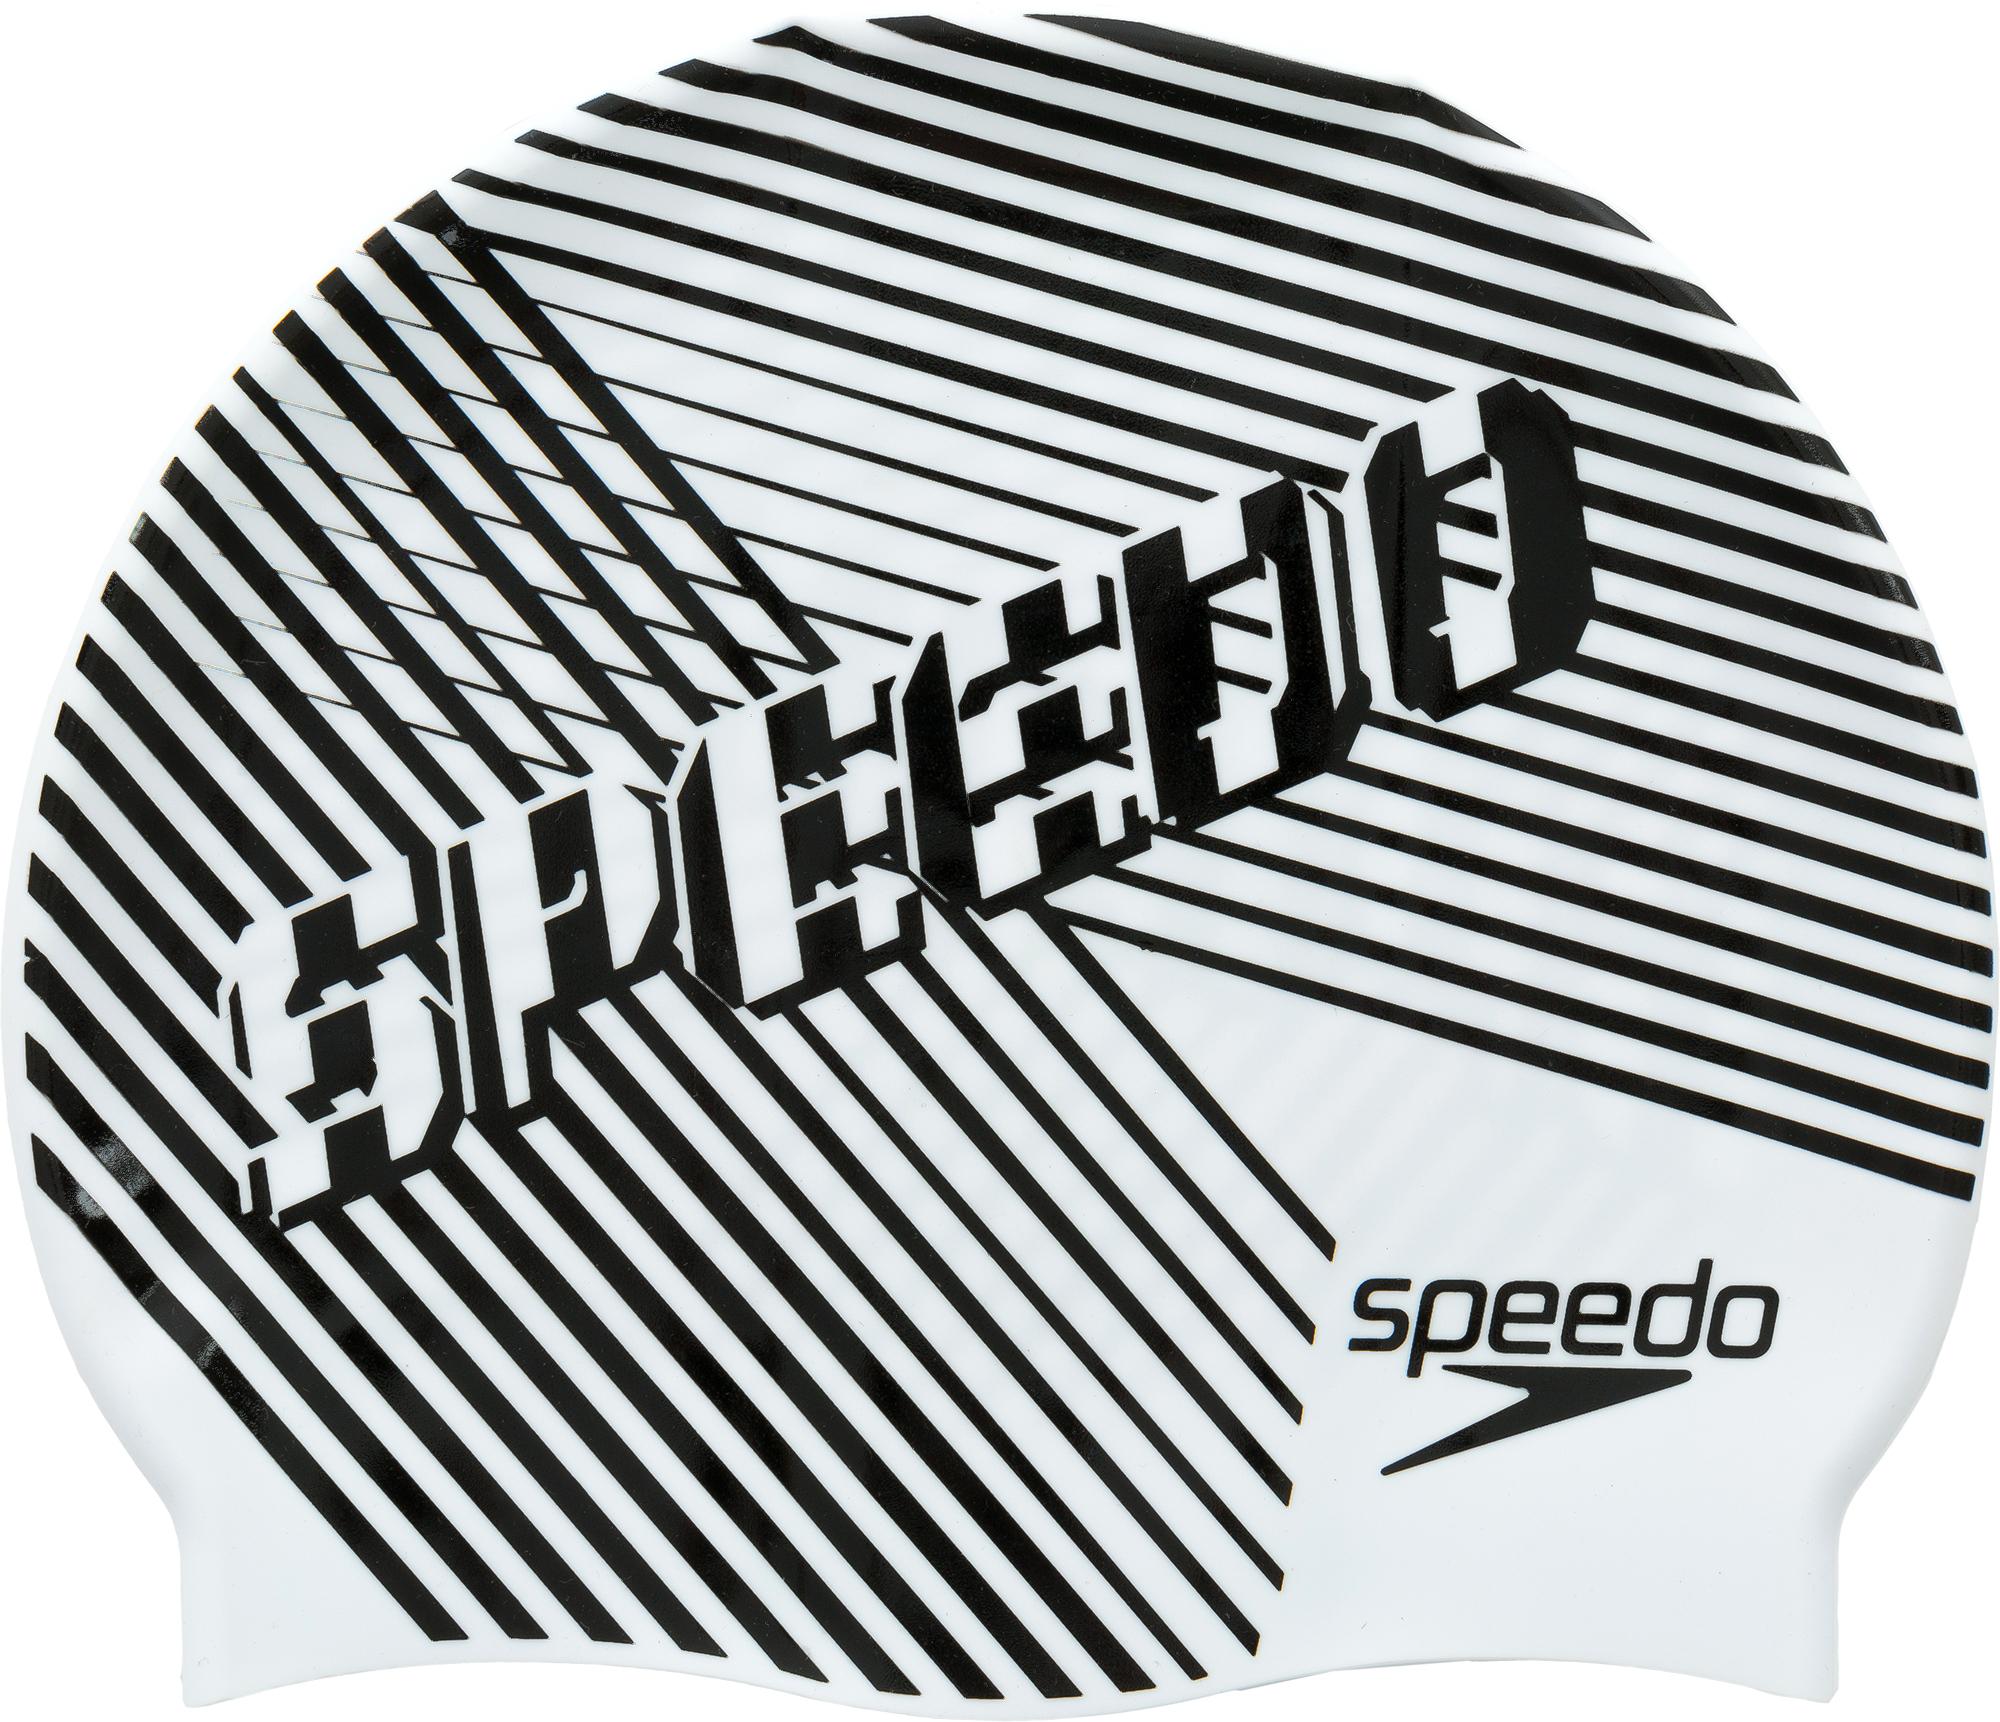 Speedo Шапочка для плавания детская Speedo Slogan, размер Без размера все цены